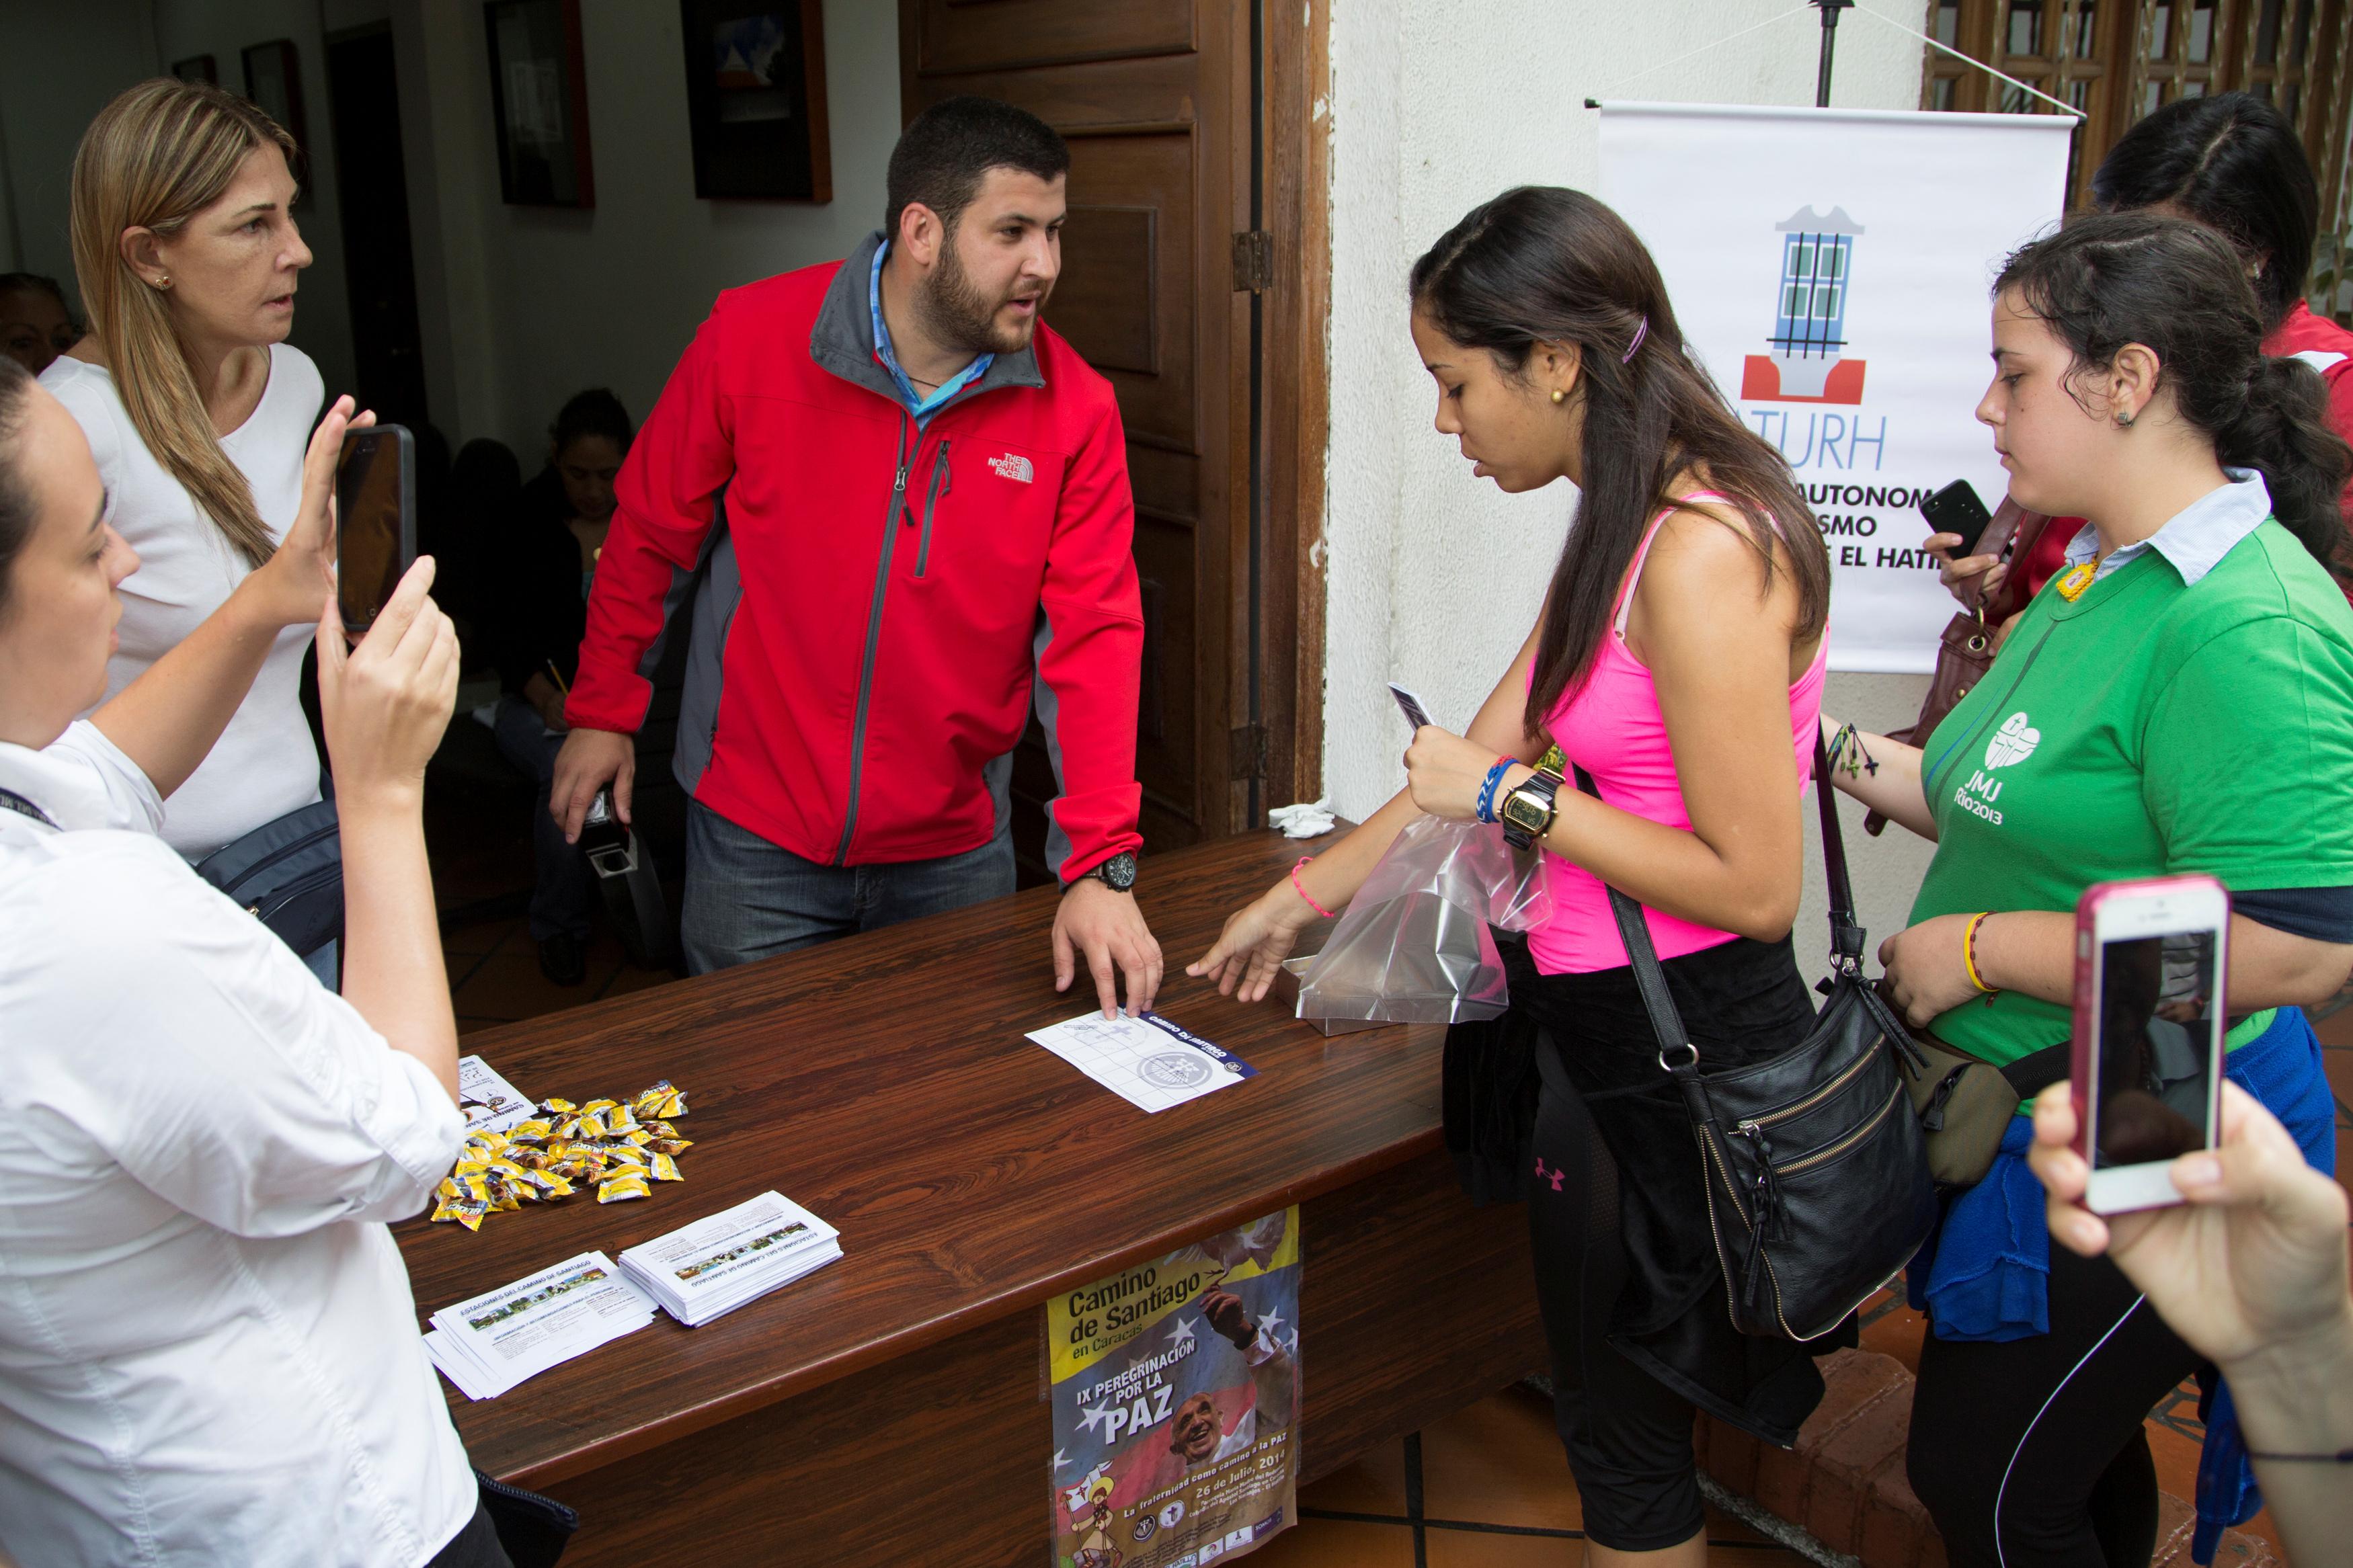 David Smolansky talks to a woman at El Hatillo town hall in Caracas in 2014.